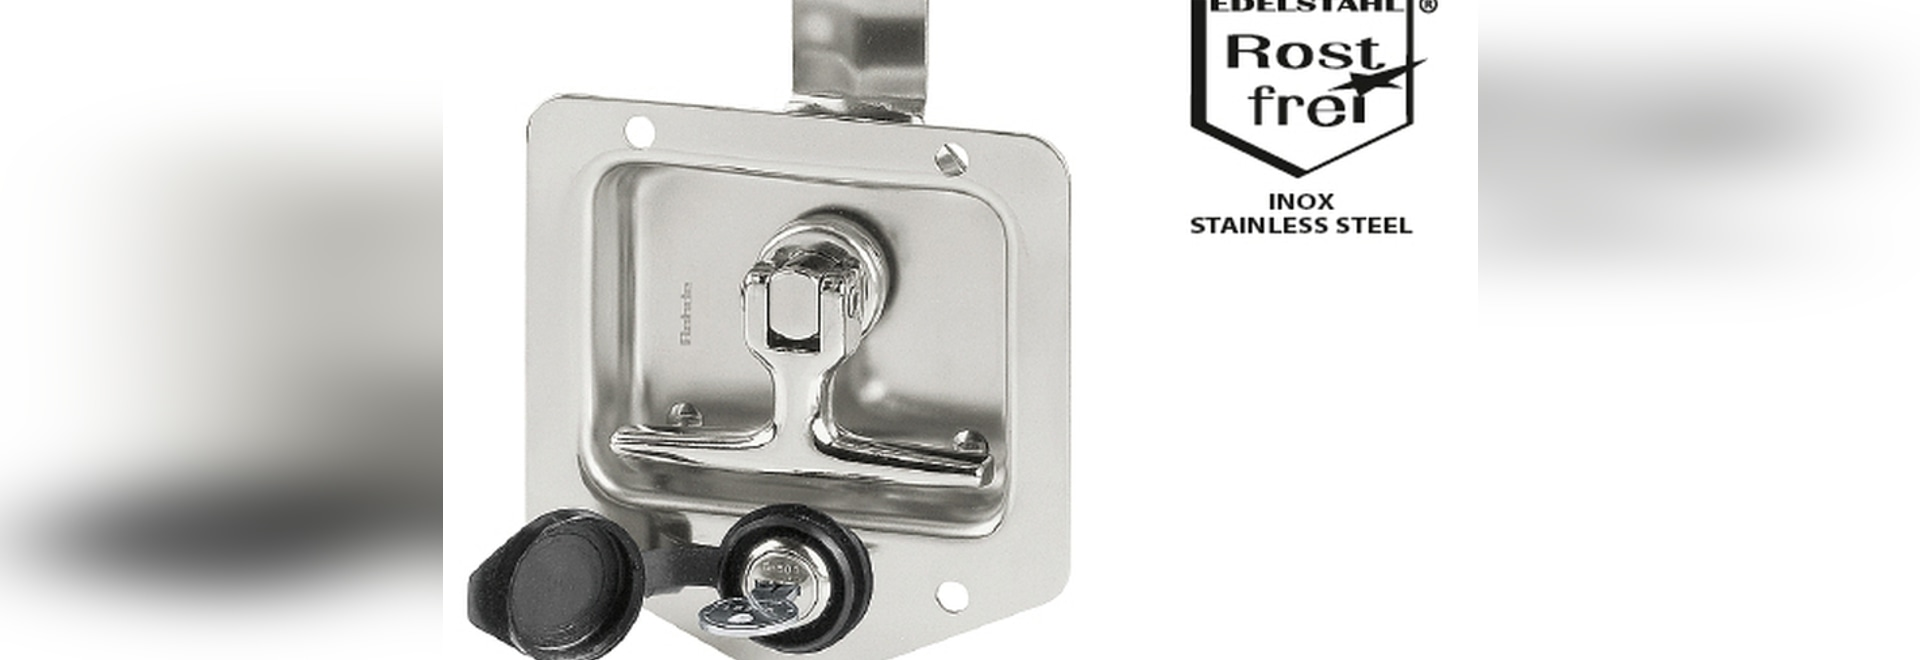 Stainless Steel Installation Handle EE-04